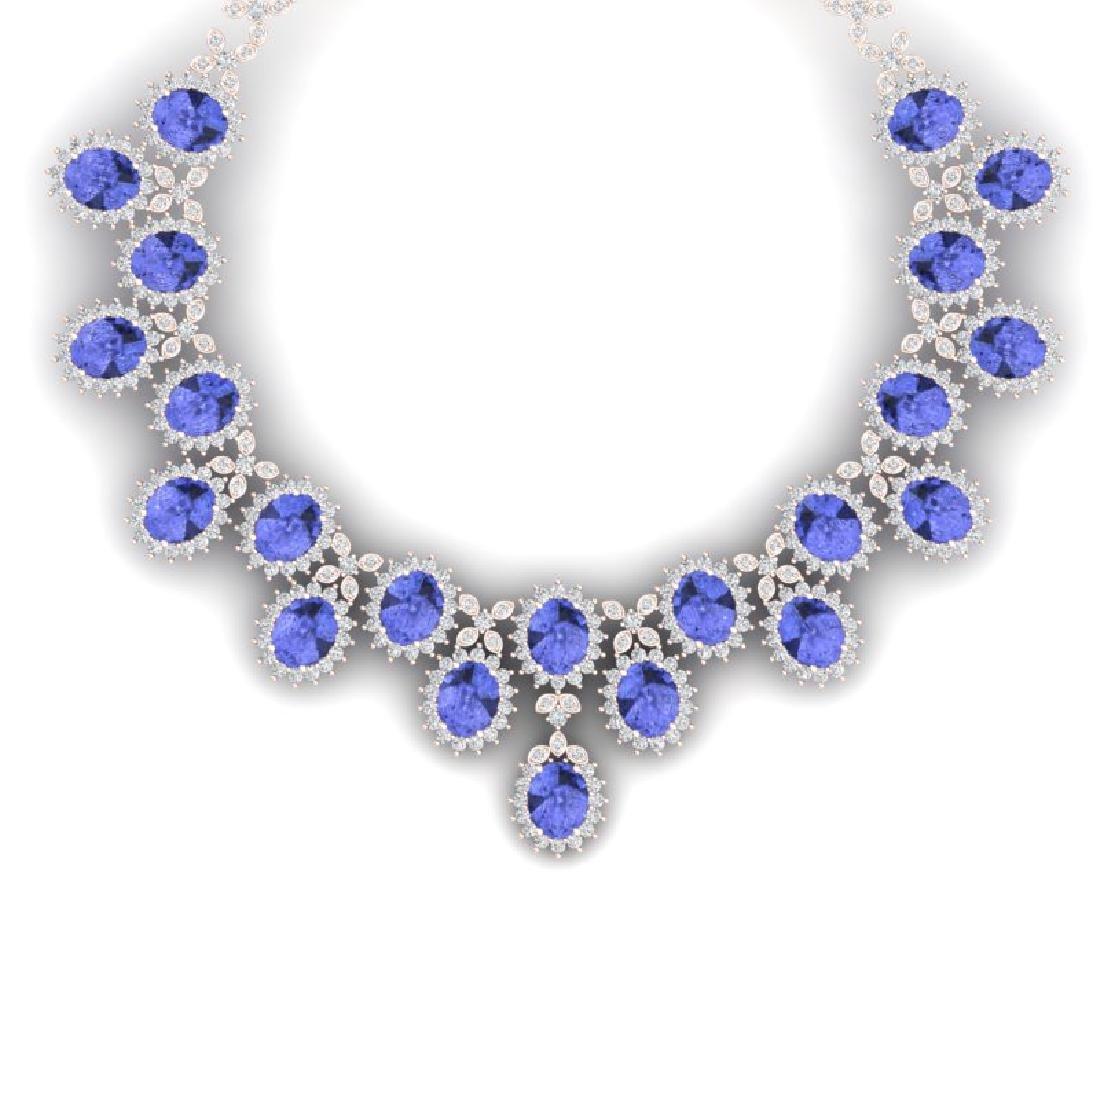 86 CTW Royalty Tanzanite & VS Diamond Necklace 18K Rose